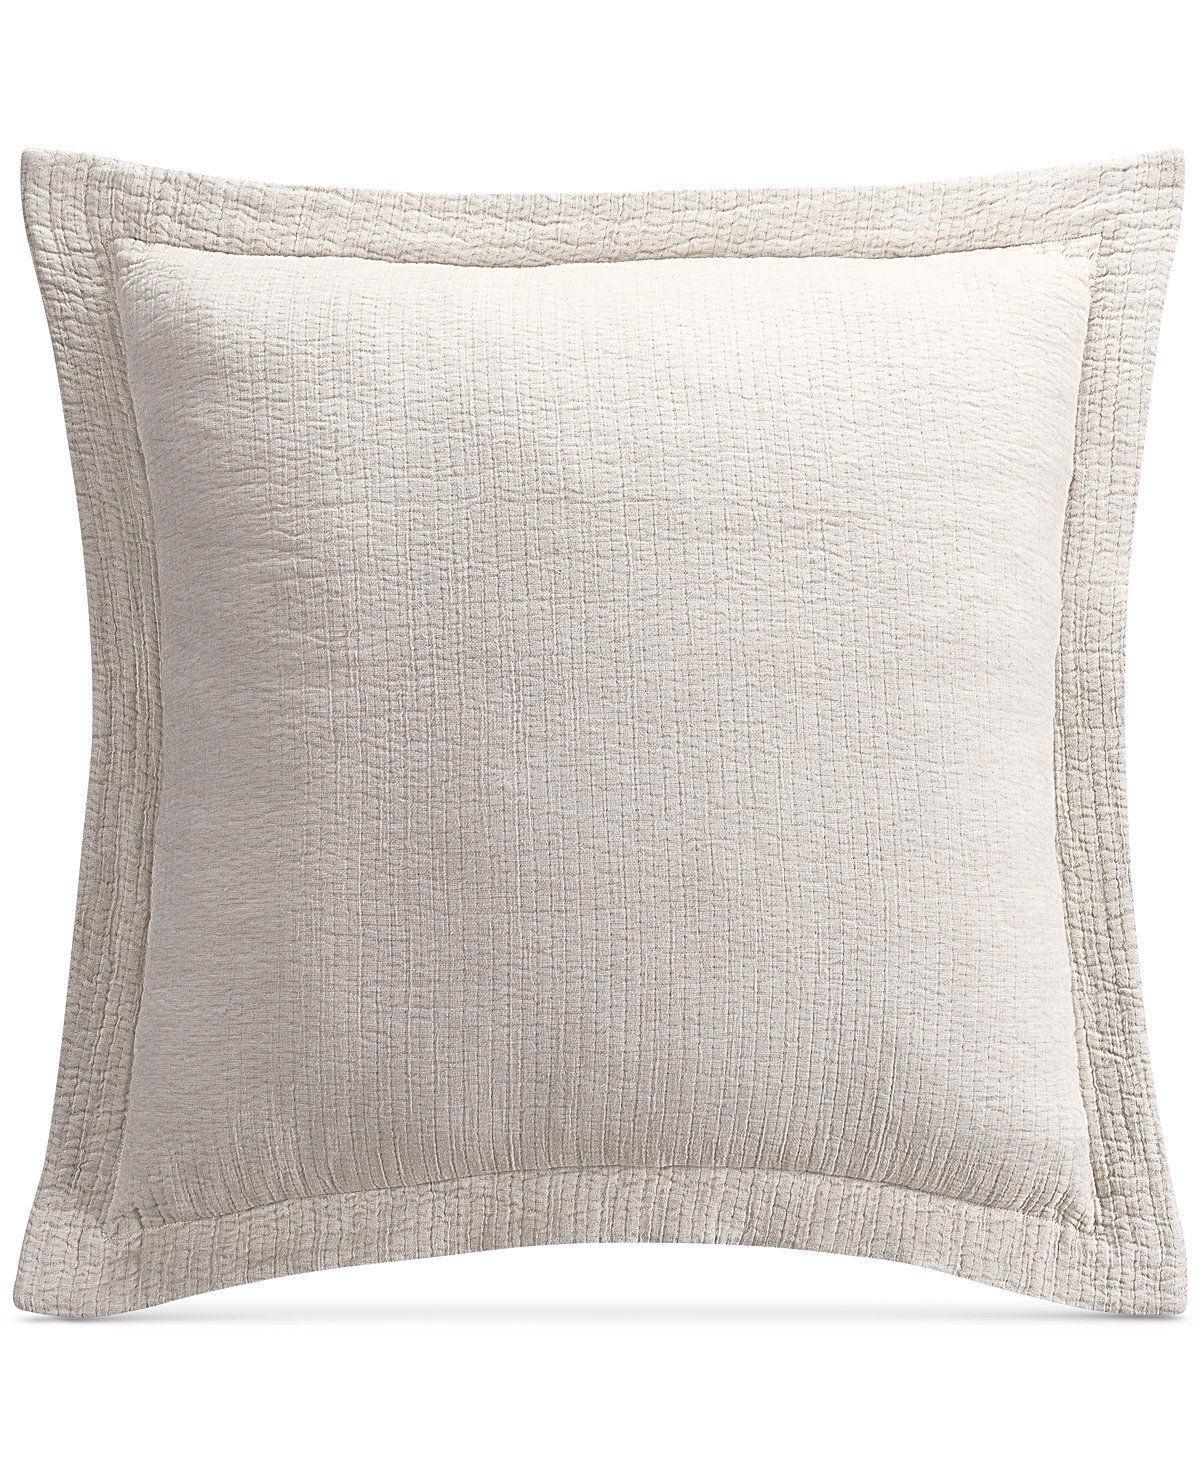 TWO Savannah Home Sakura Paisley Quilted Euro Pillow Shams Light Beige  200 NEW